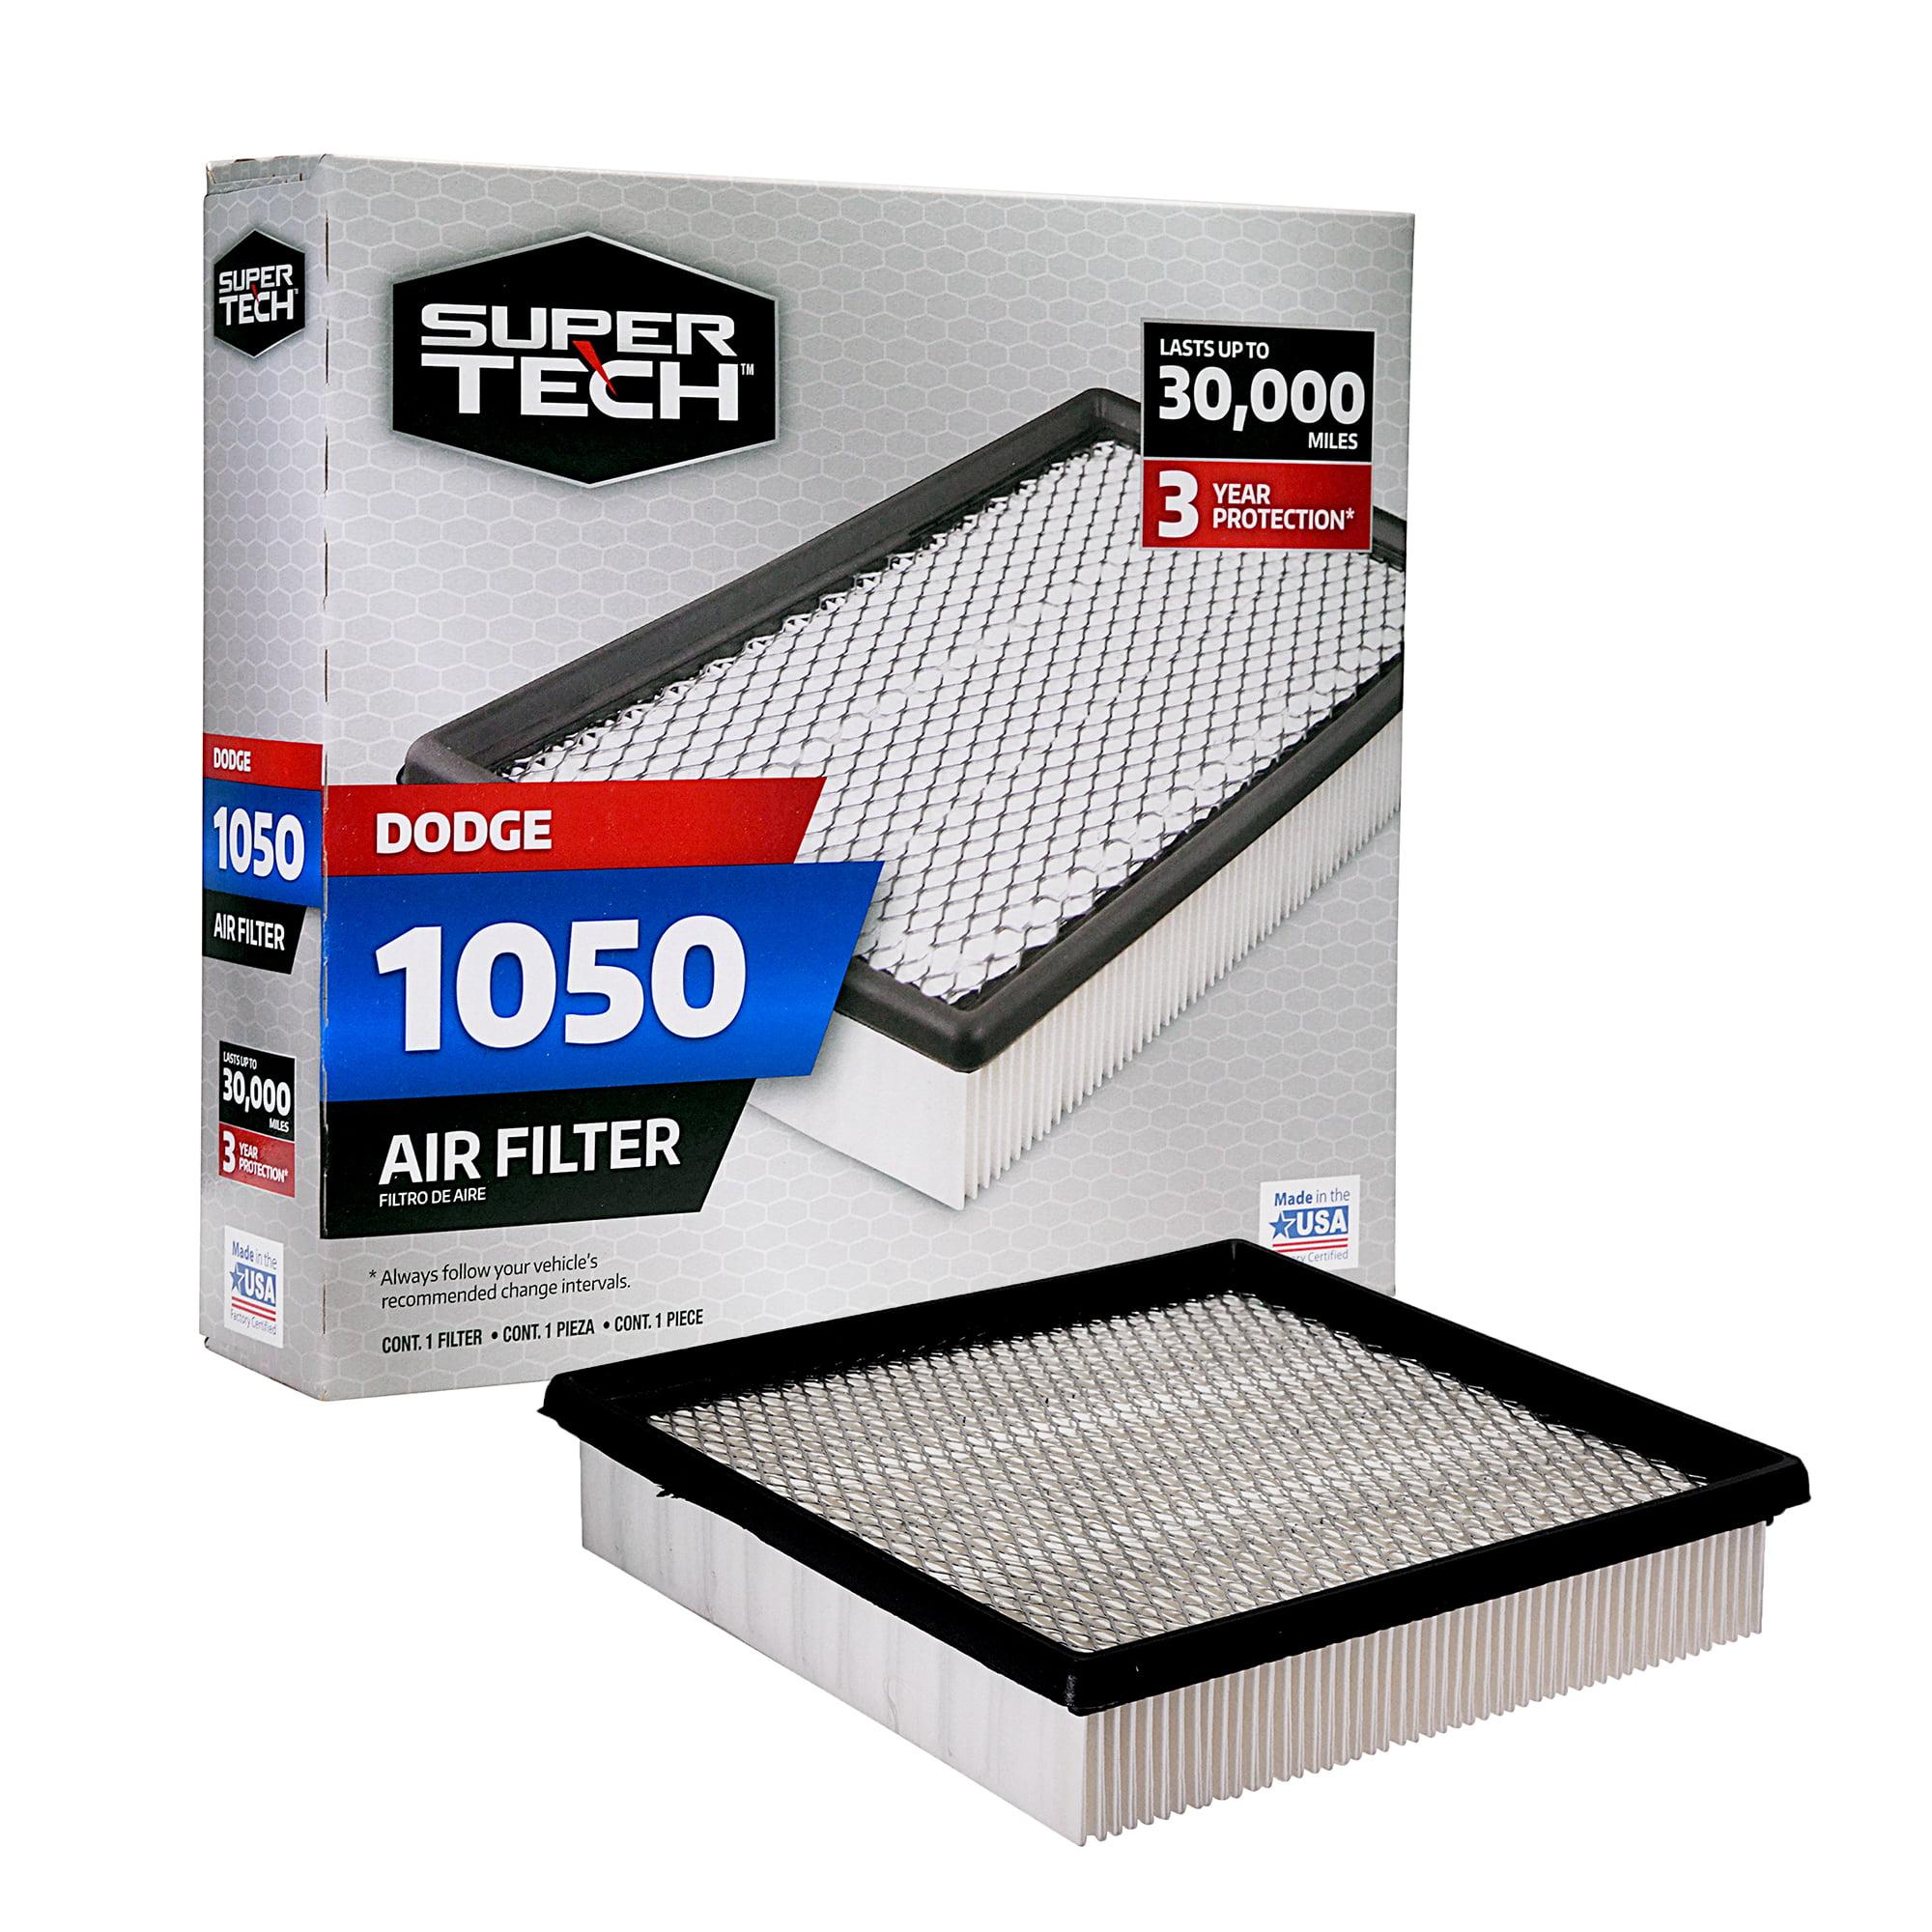 Supertech 1050 Engine Air Filter Replacement Filter For Chrysler Or Dodge Walmart Com Walmart Com